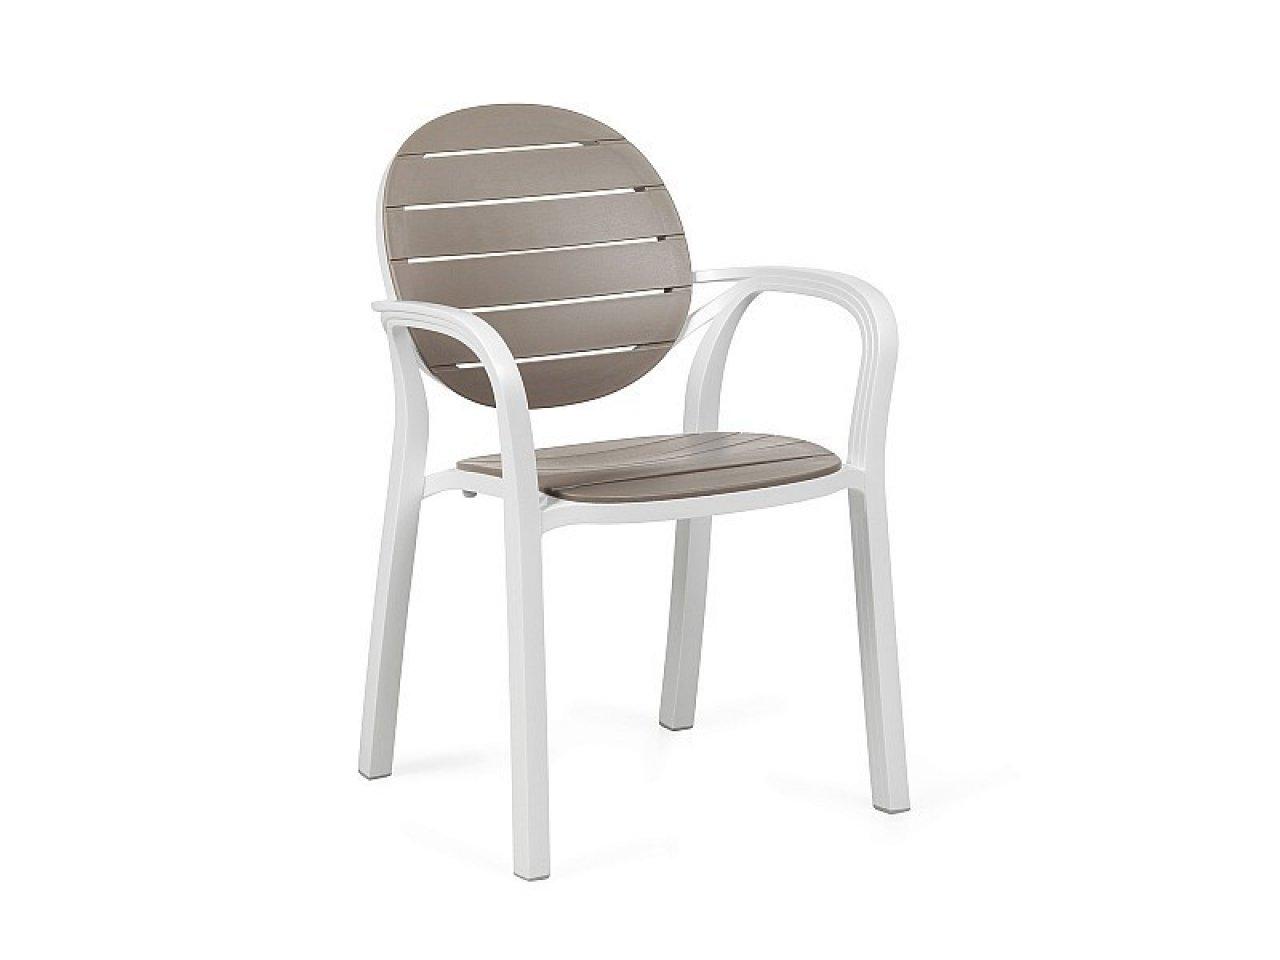 Sedia Con Braccioli Palma - v1